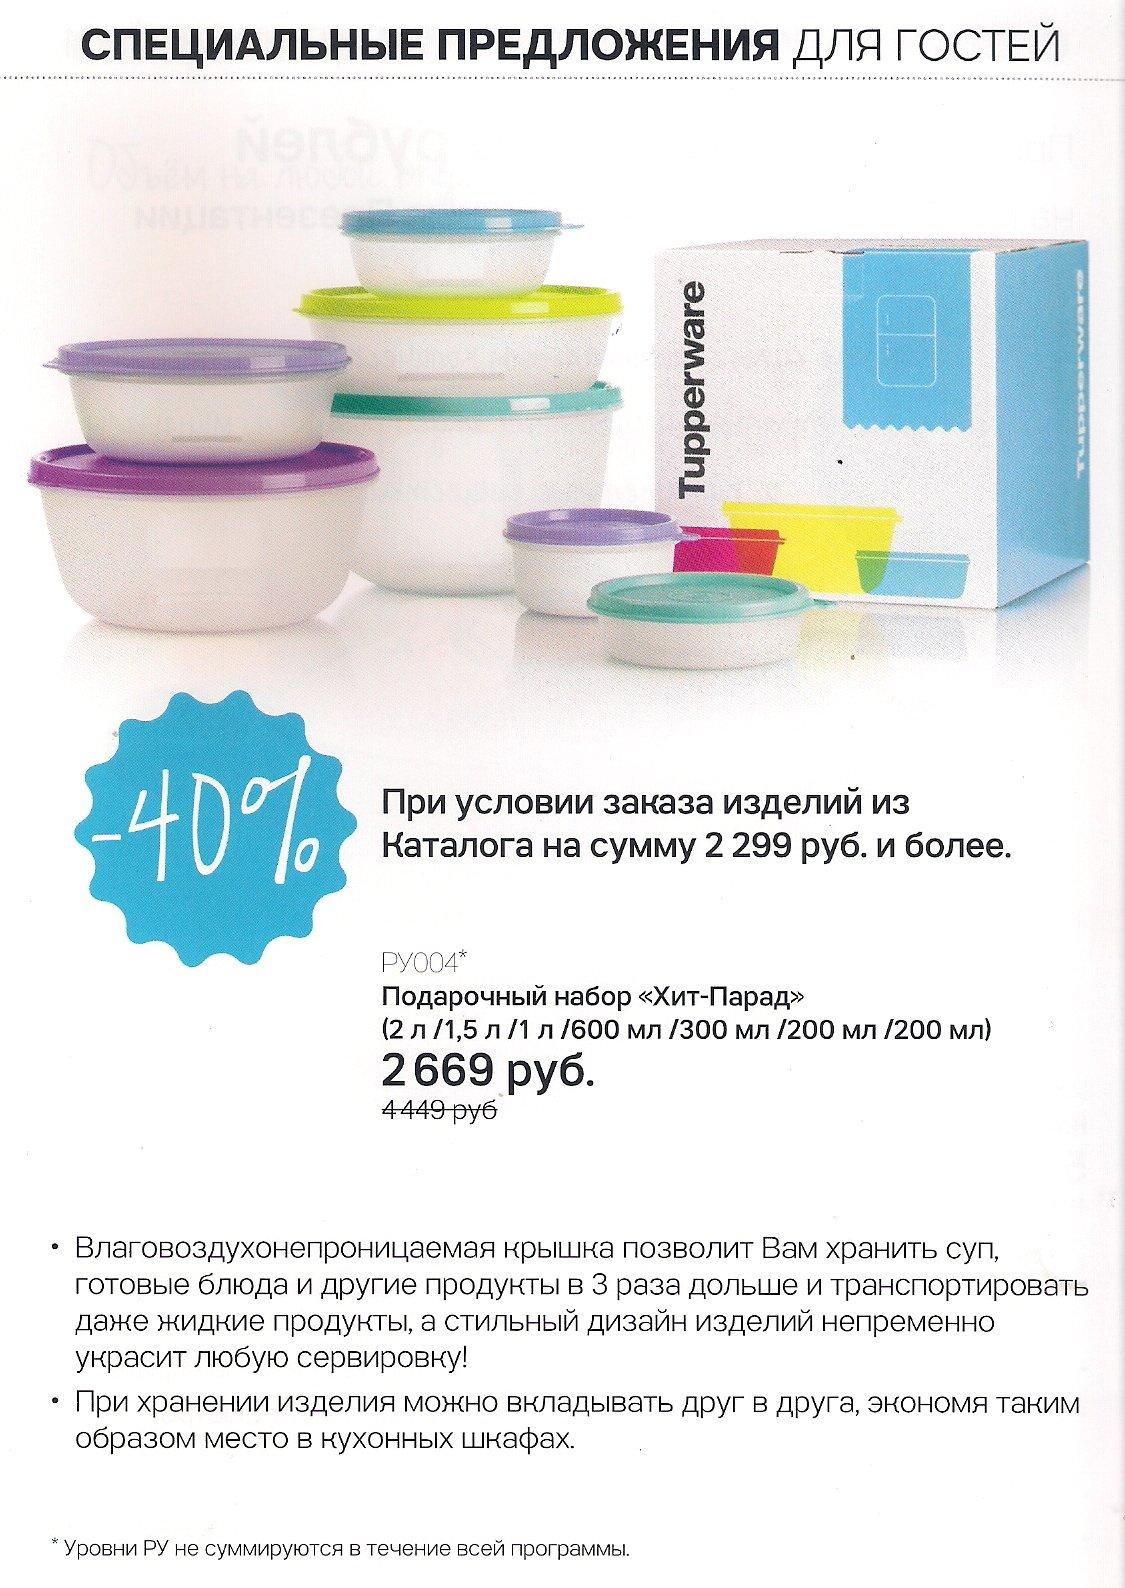 http://tupperware-online.ru/images/upload/8g.jpg